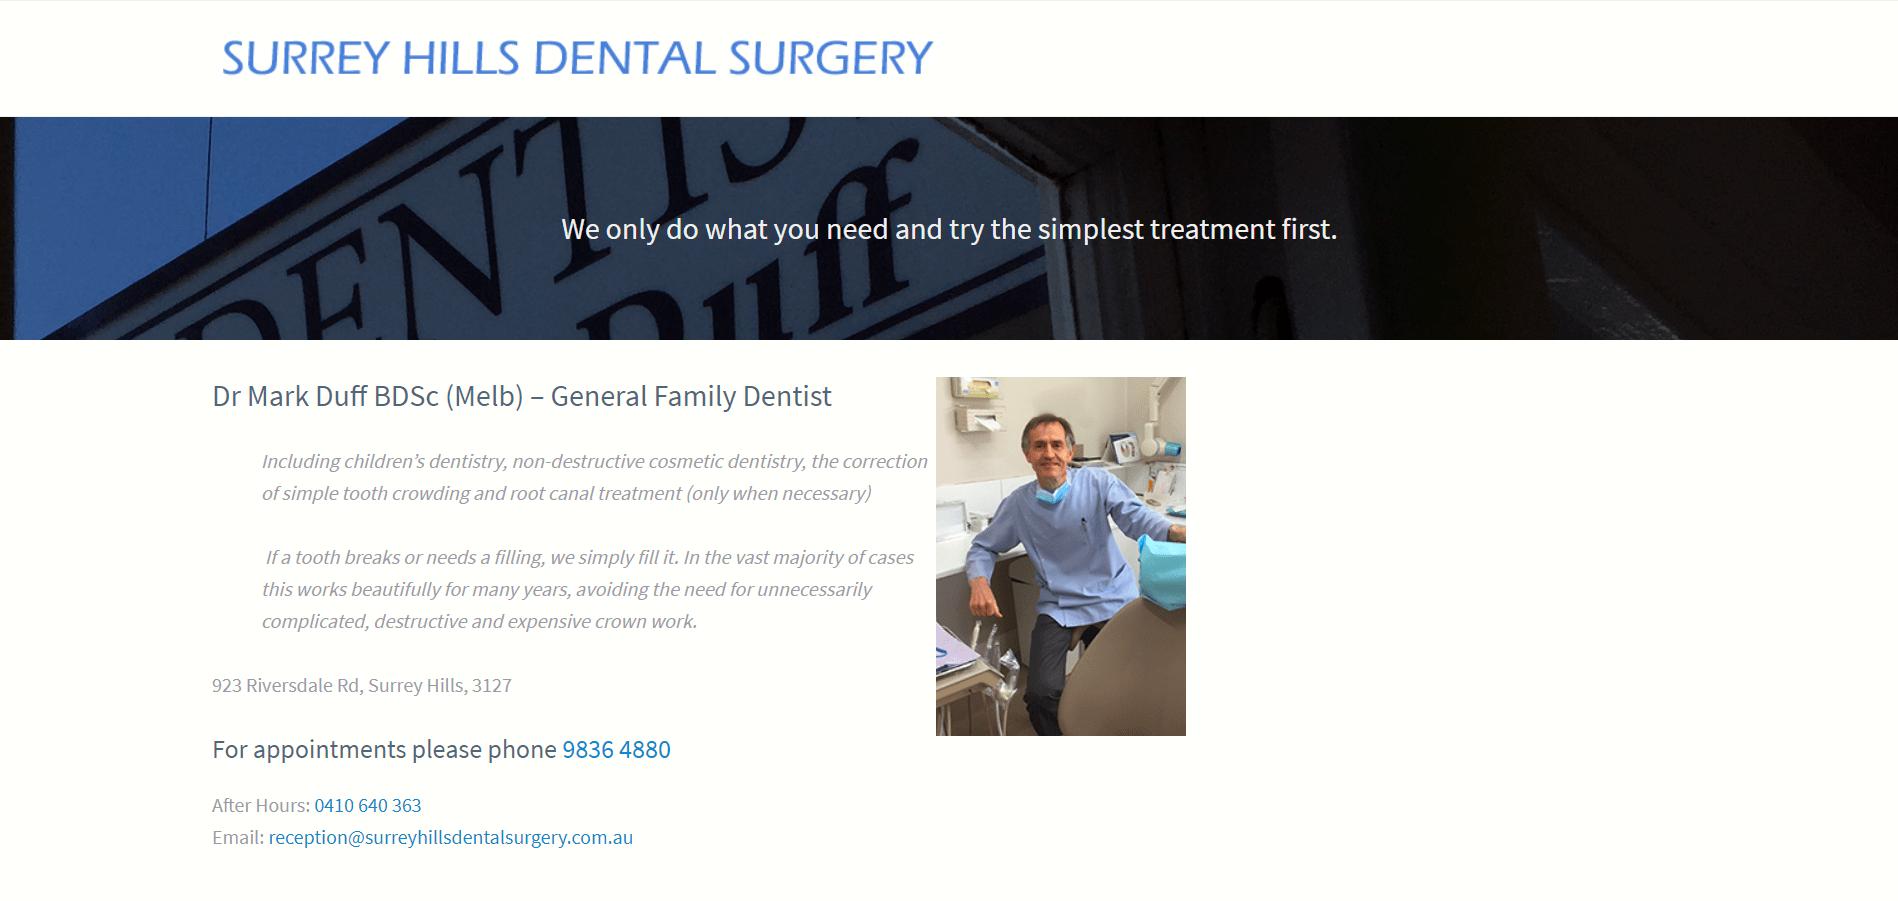 Surrey Hills Dental Surgery